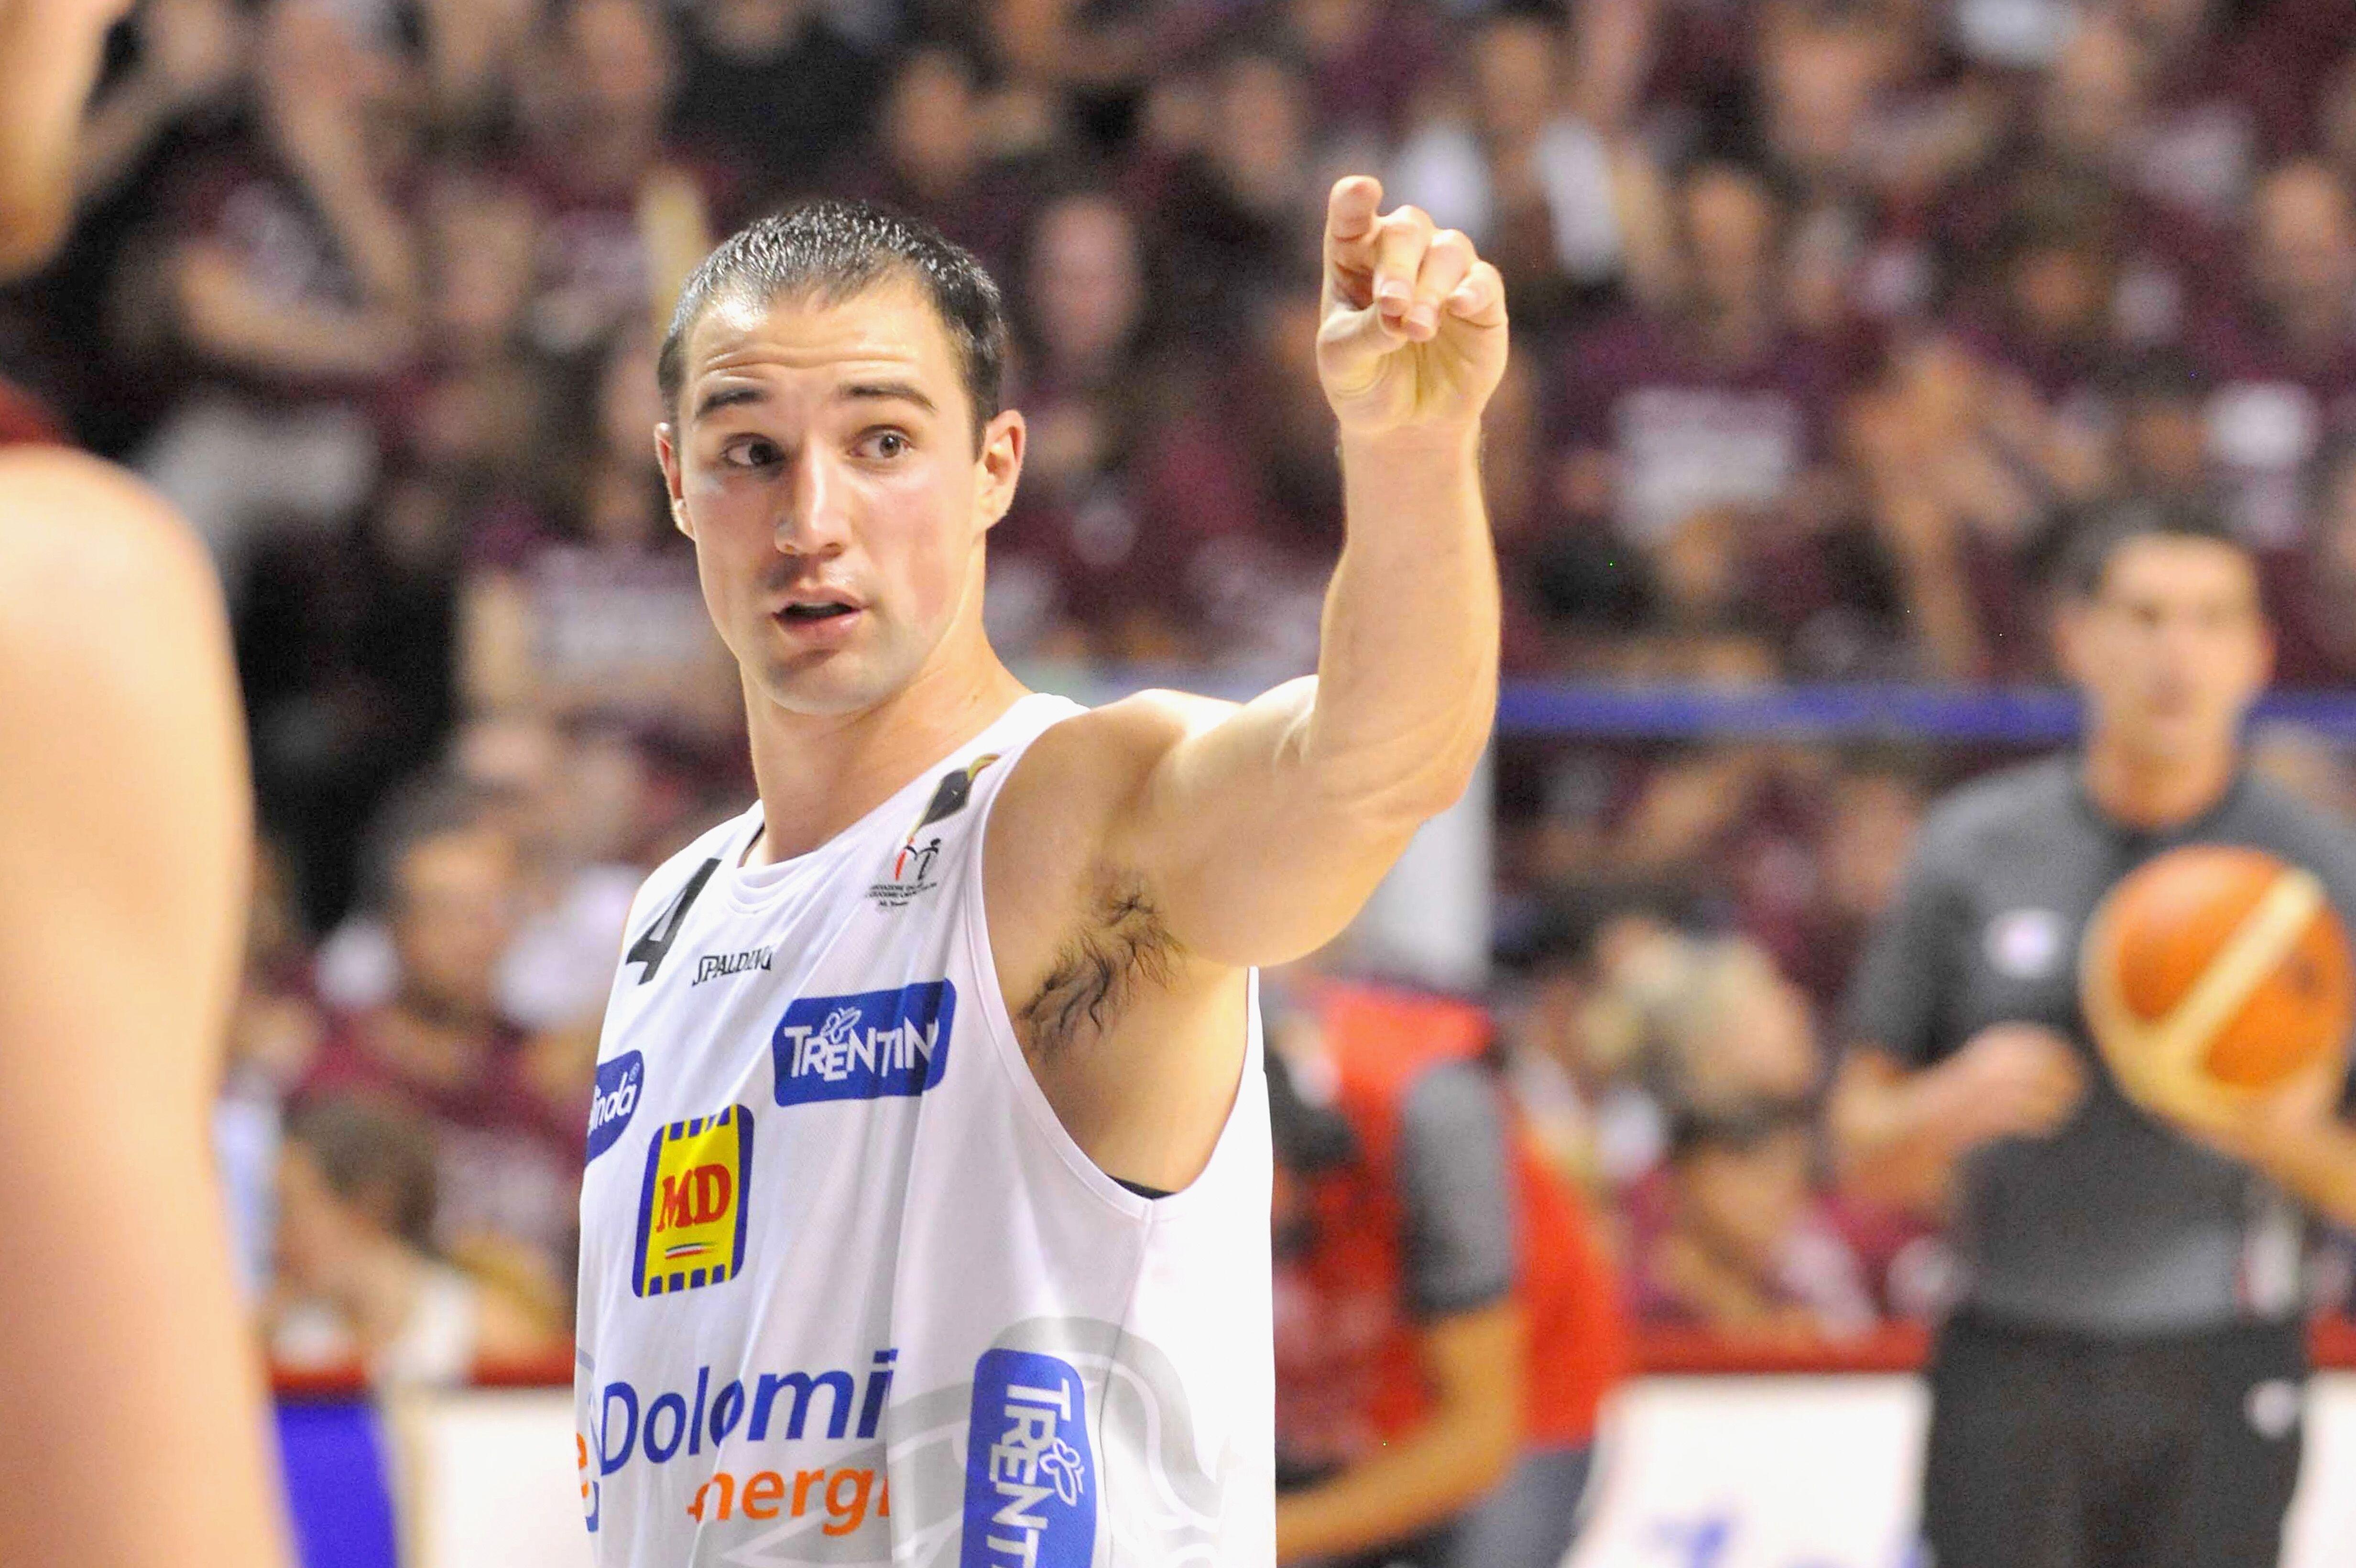 695460026-reyer-umana-venezia-v-dolomiti-aquila-trento-legabasket-serie-a-playoff-final-game-1.jpg